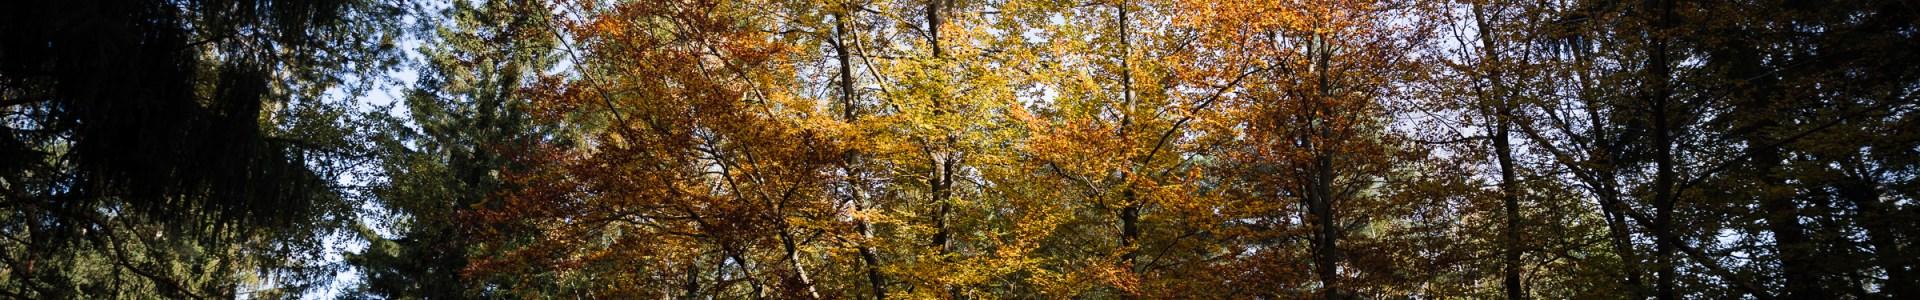 Fotodings – In den Thüringer Wald geguckt